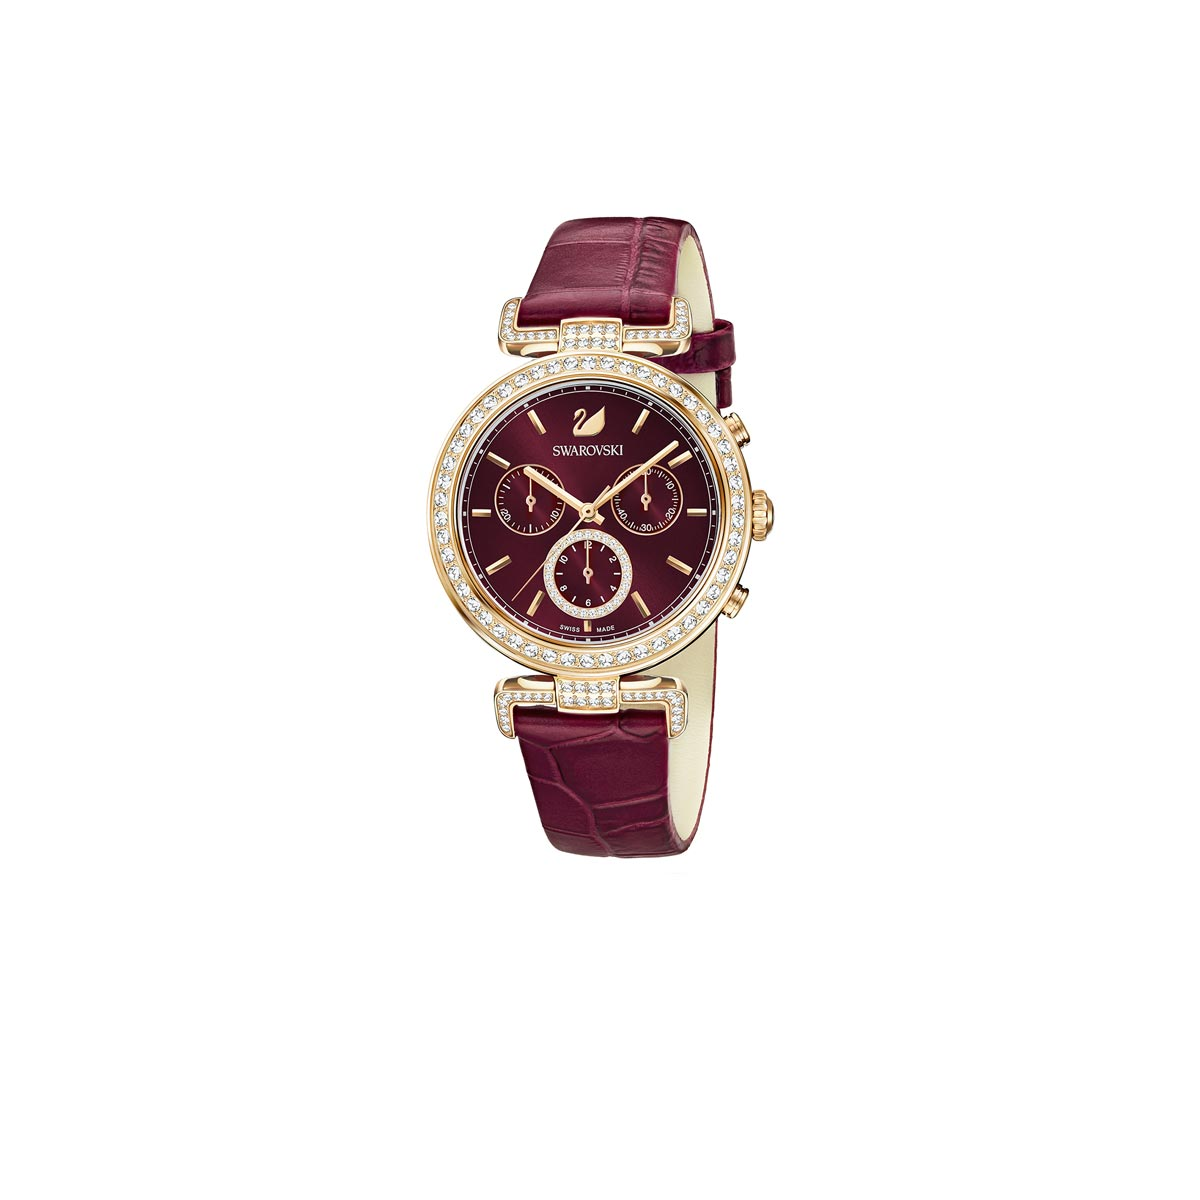 Swarovski shopping watches for Swarovski crystals watch